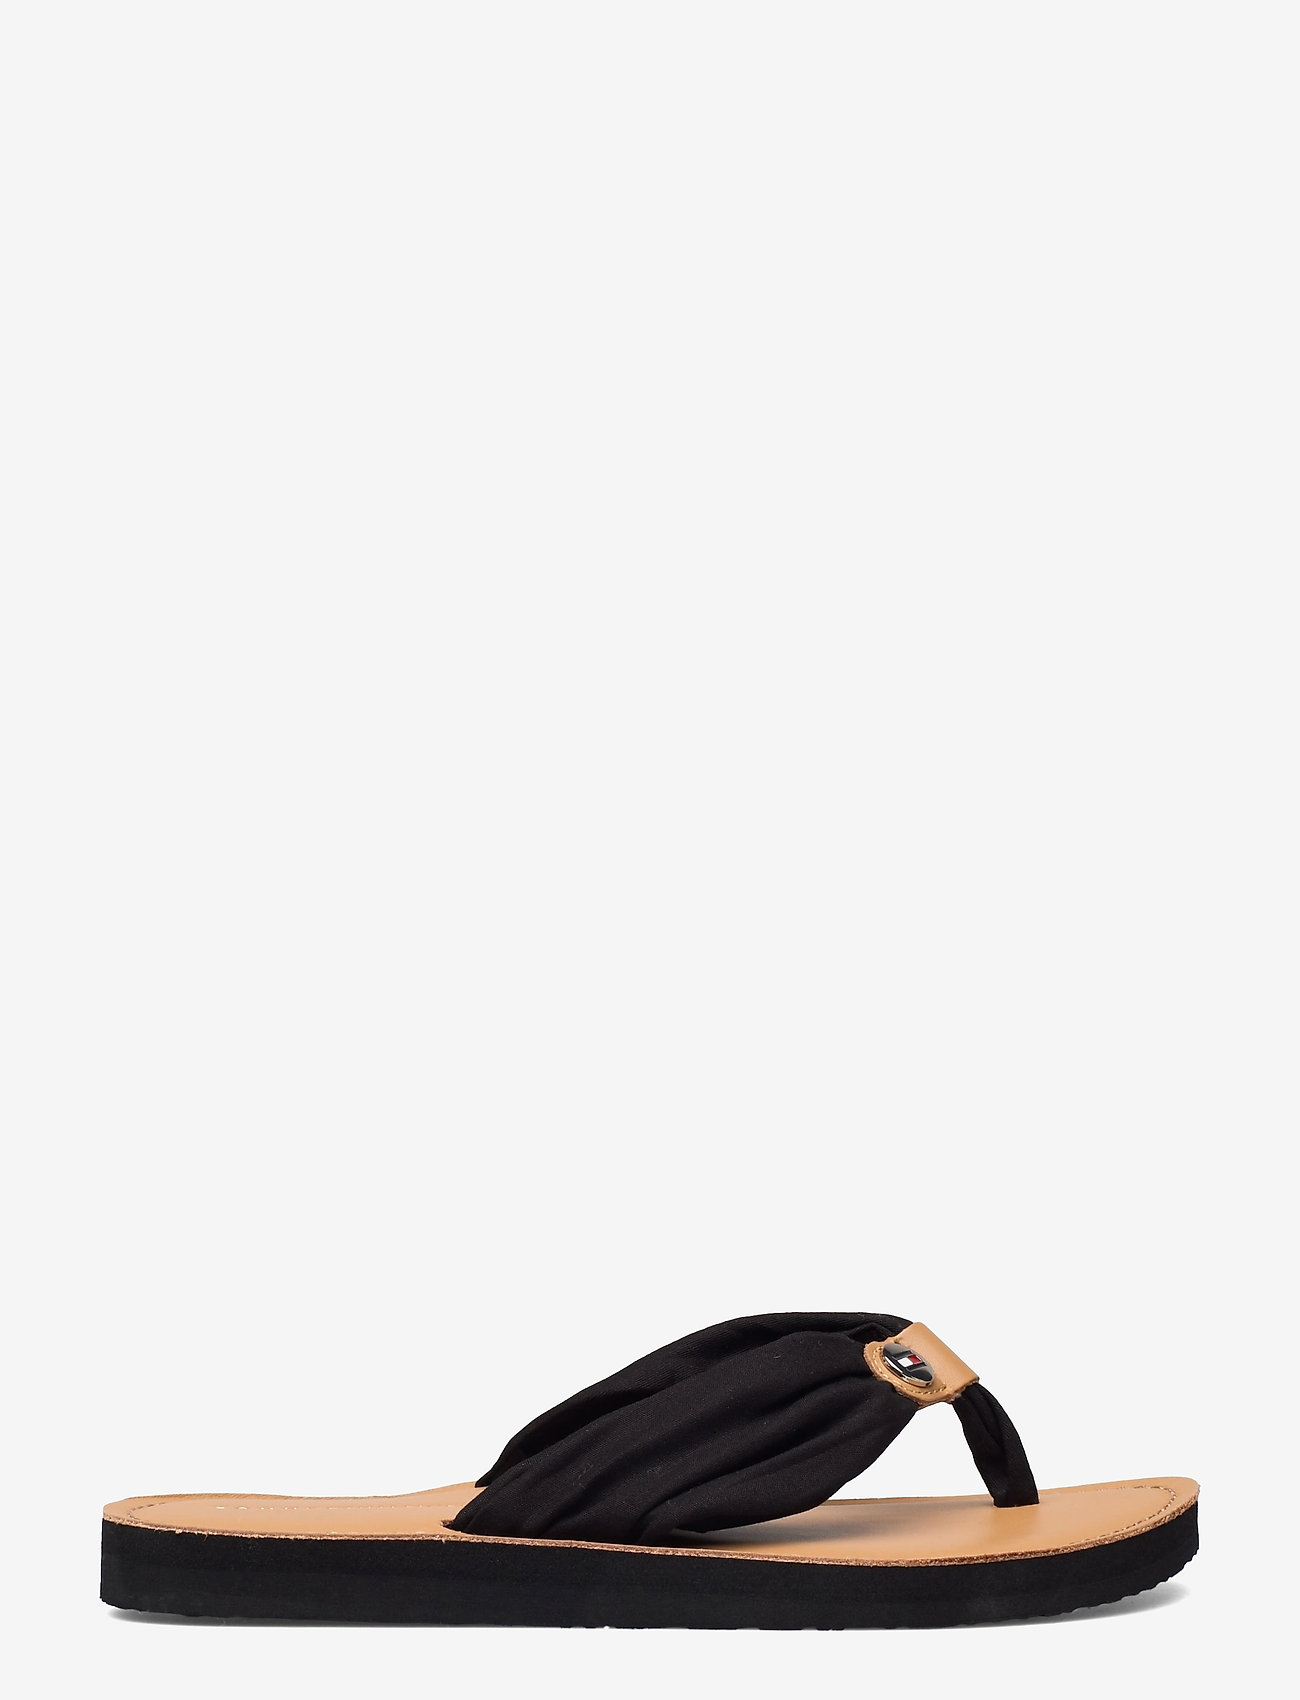 Tommy Hilfiger - LEATHER FOOTBED BEACH SANDAL - flat sandals - black - 1